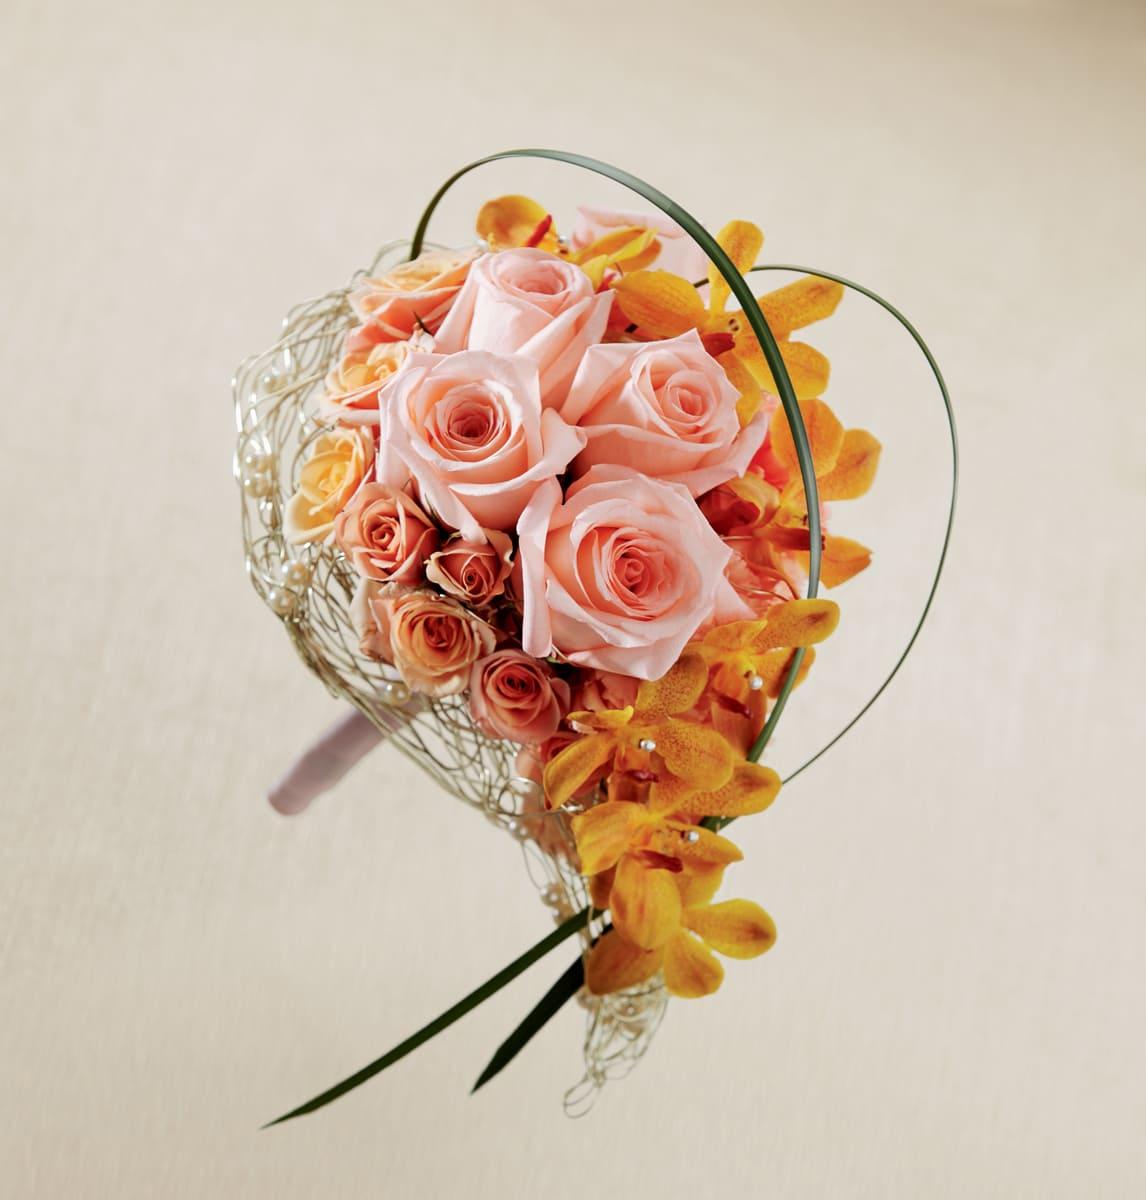 The FTD® Peach Waterfall™ Bouquet